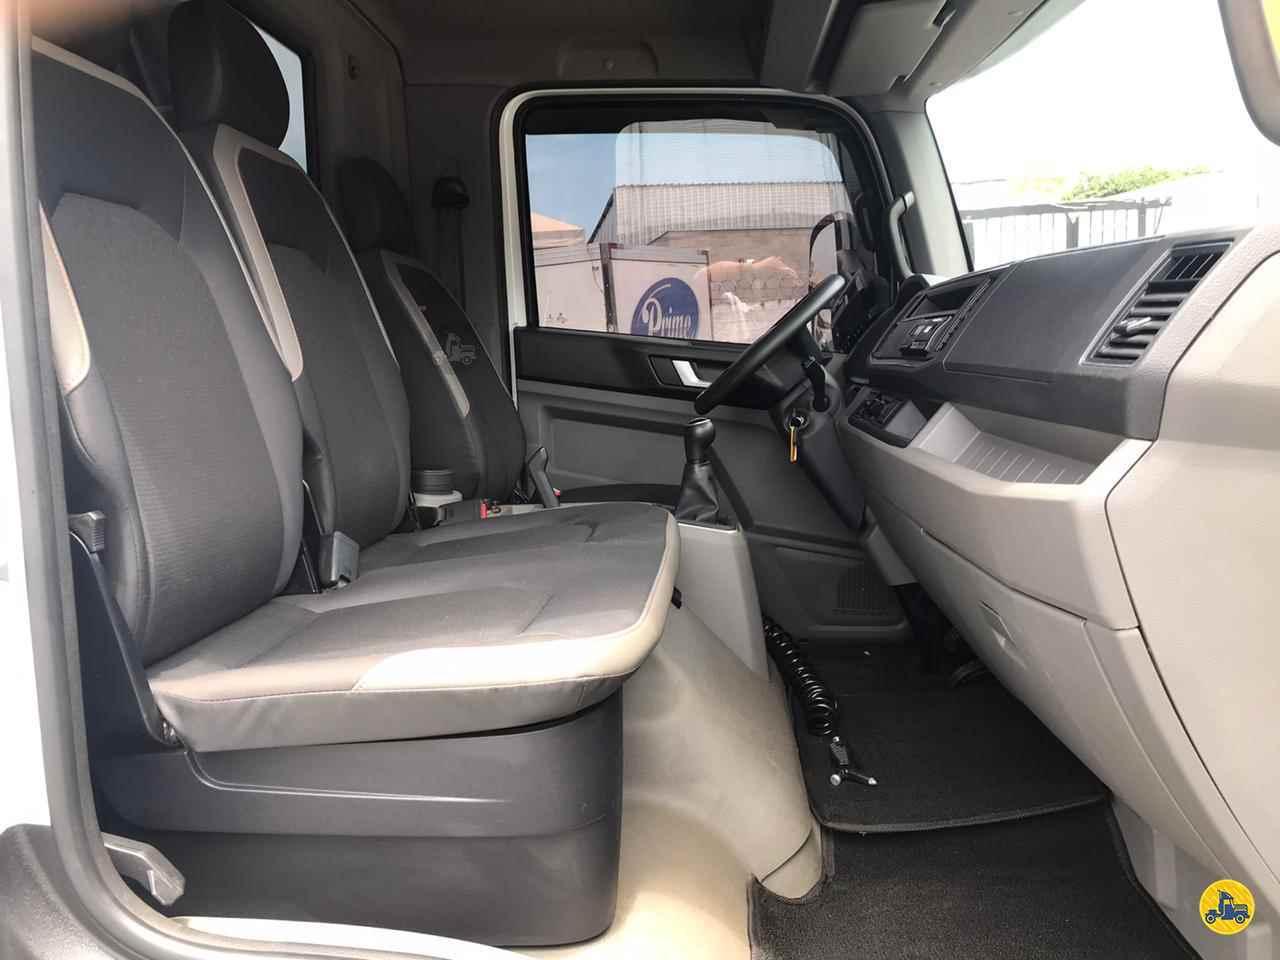 VOLKSWAGEN VW 11180 63200km 2018/2019 Prime Caminhões